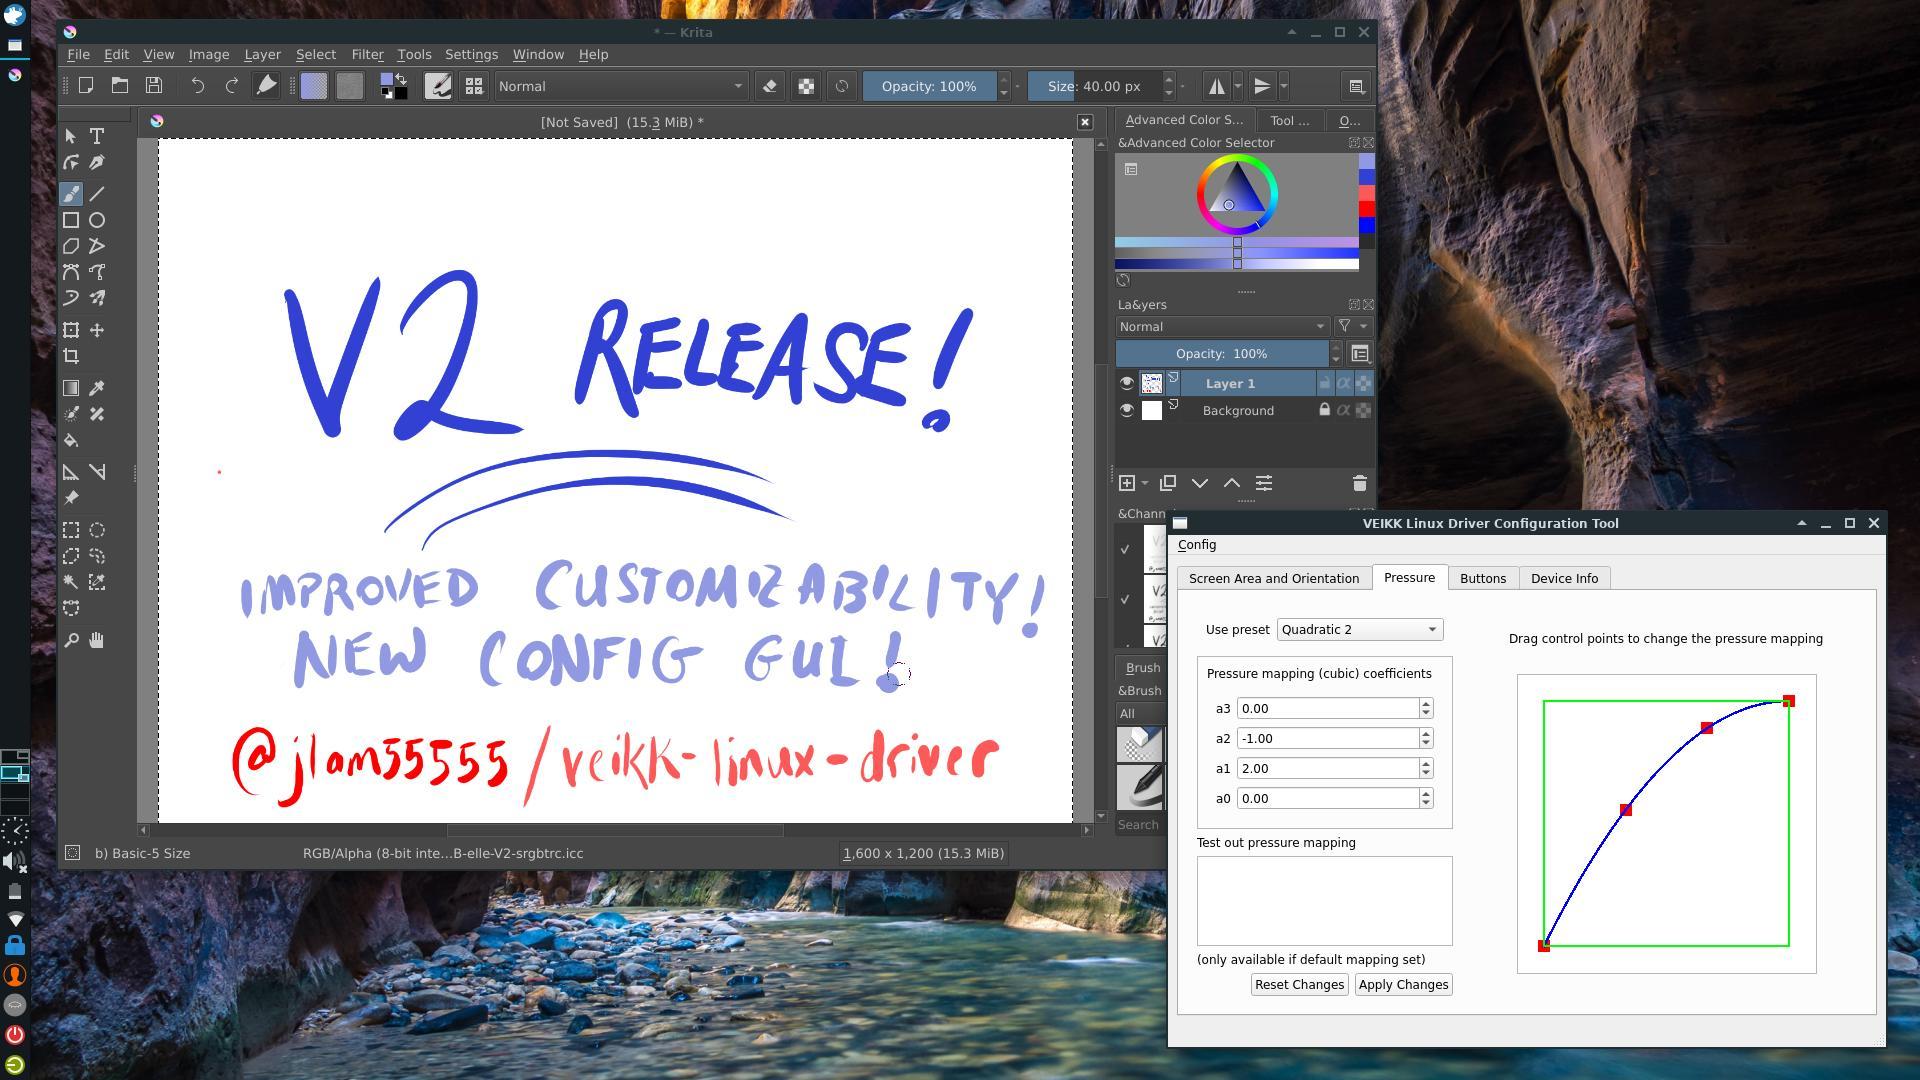 image highlighting the v2 release